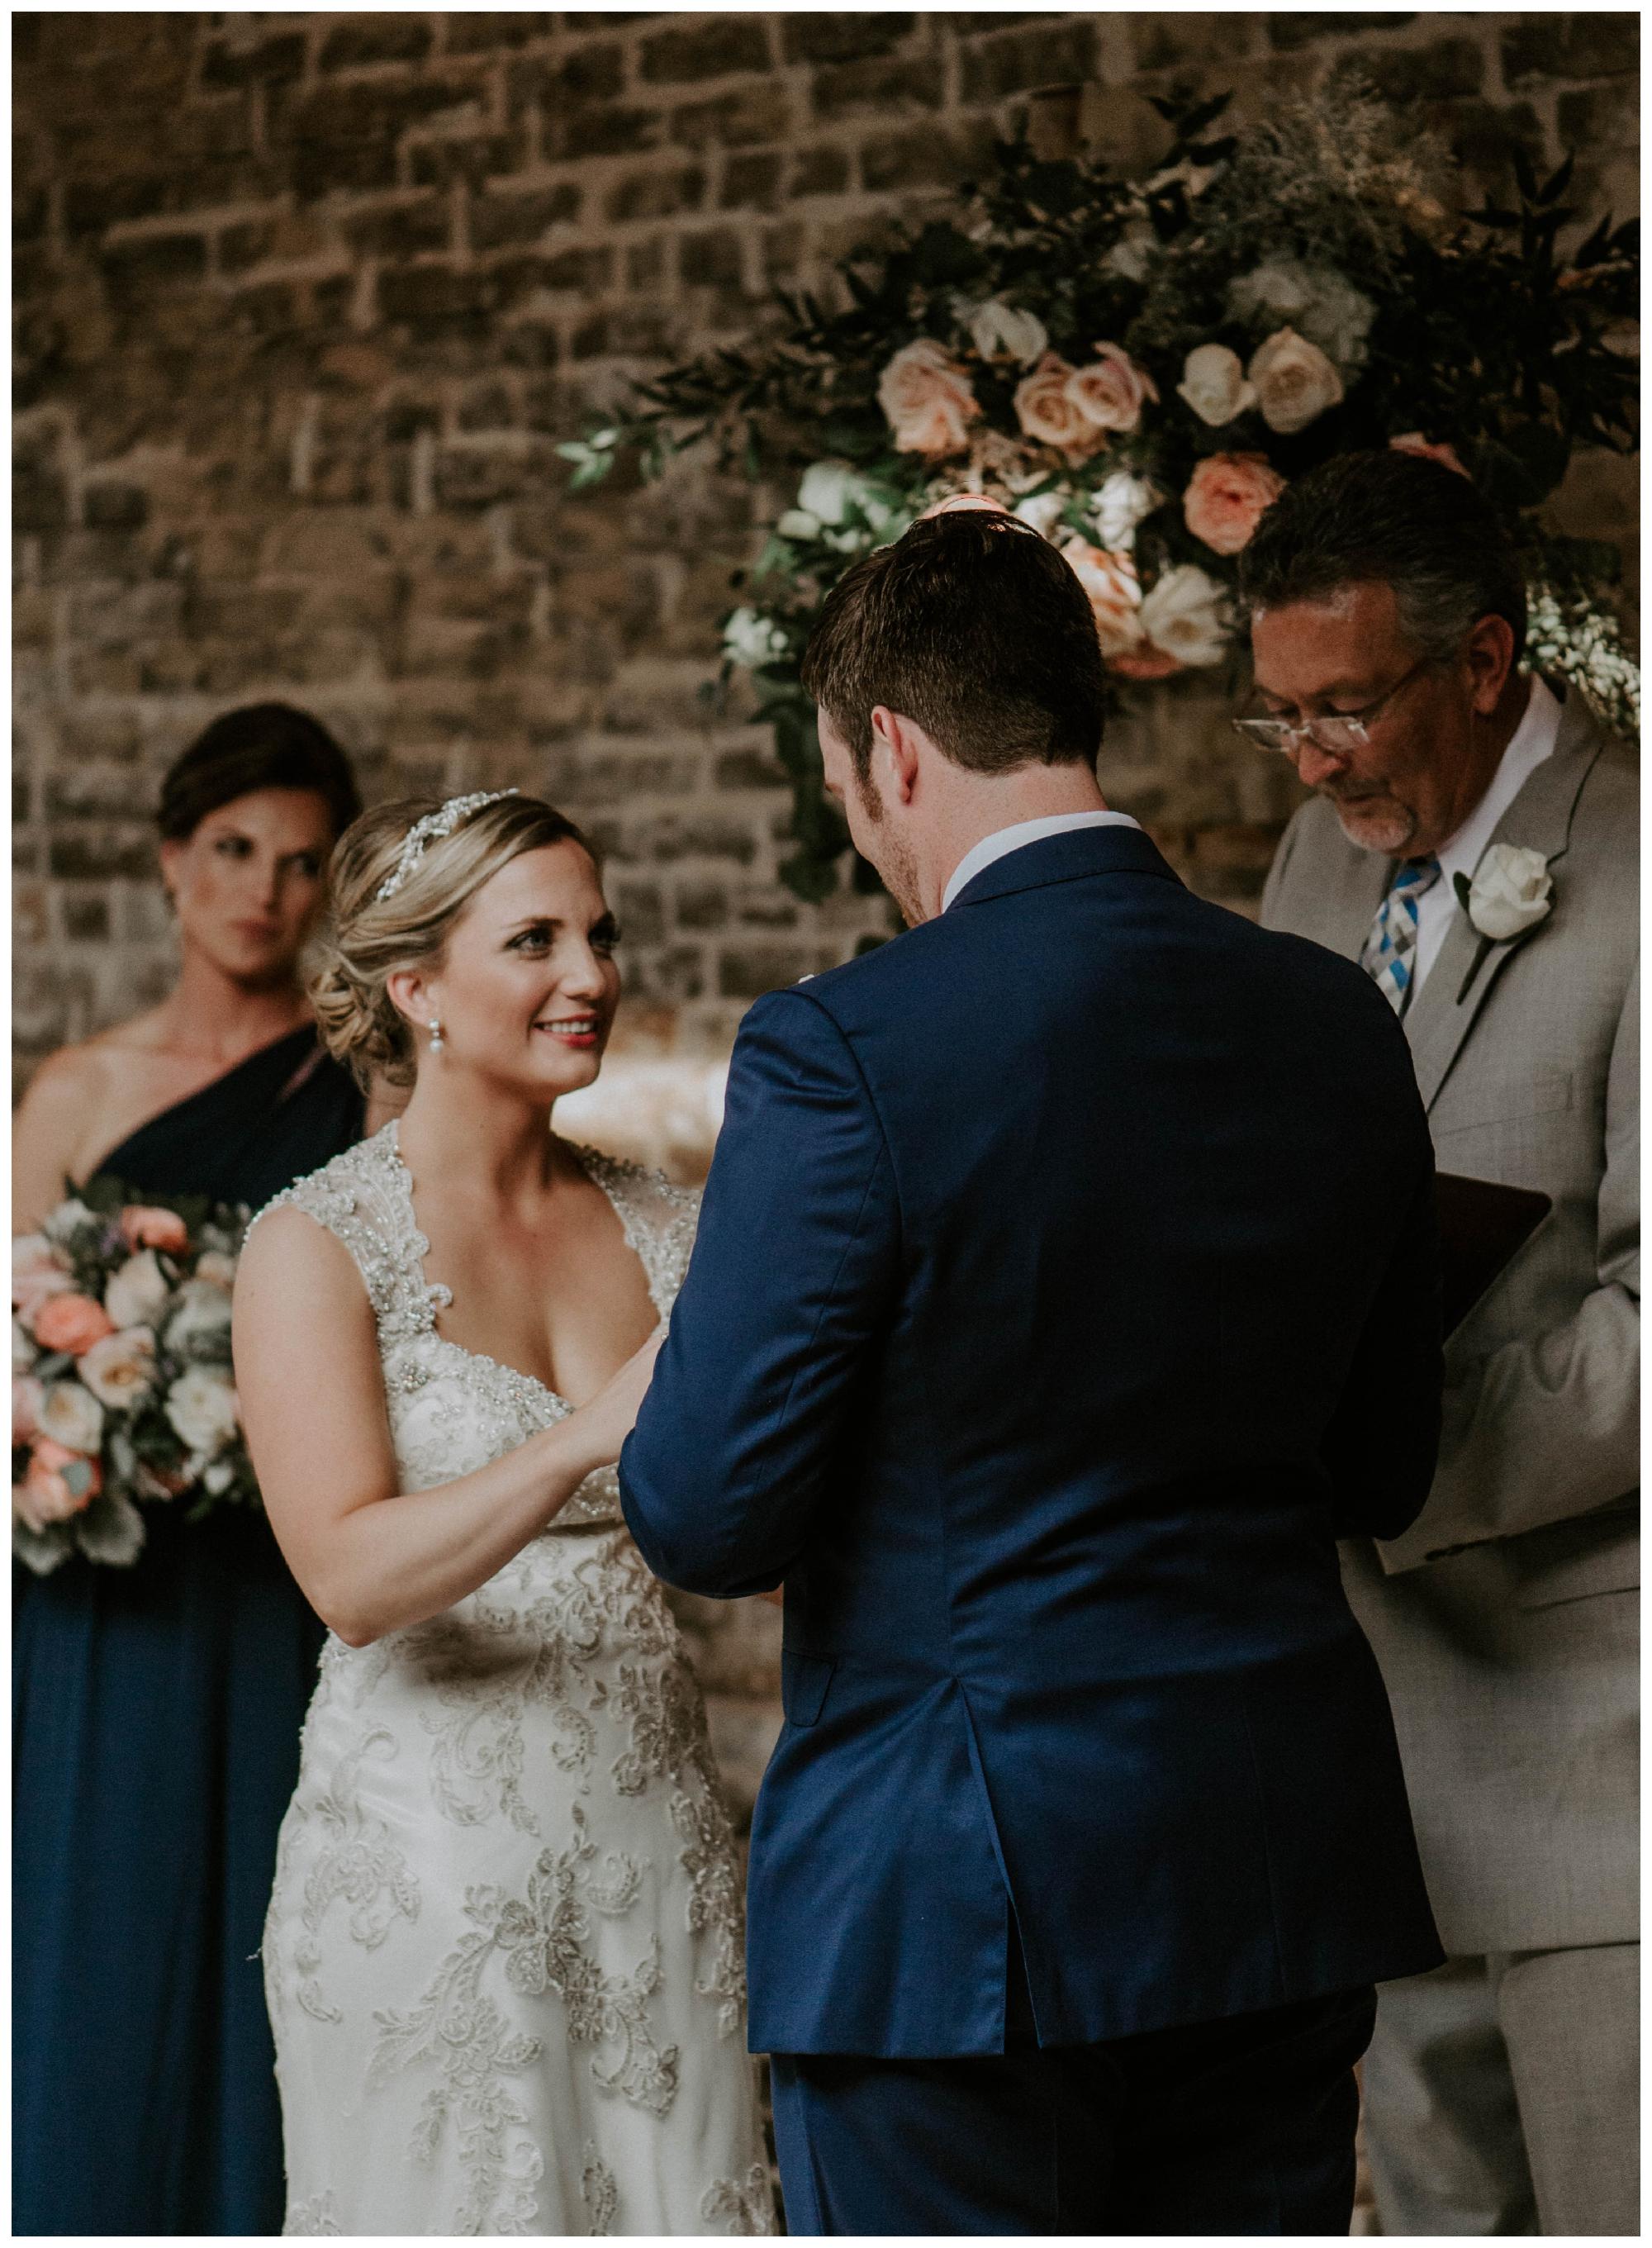 austin-texas-wedding-photography-1778-photographie_0068.jpg